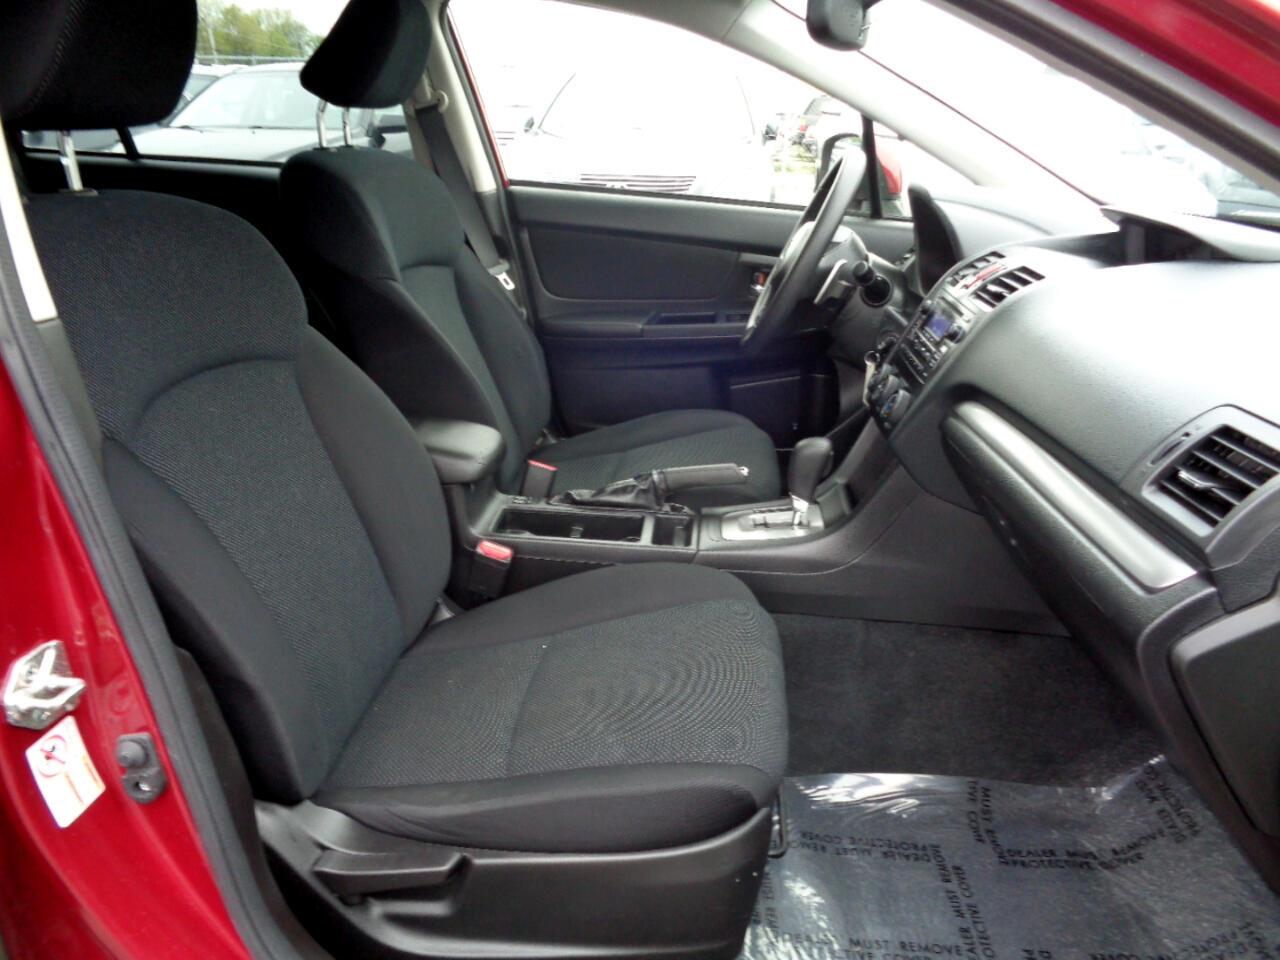 Subaru Impreza 2.0i Premium 5-Door w/All Weather Package 2013